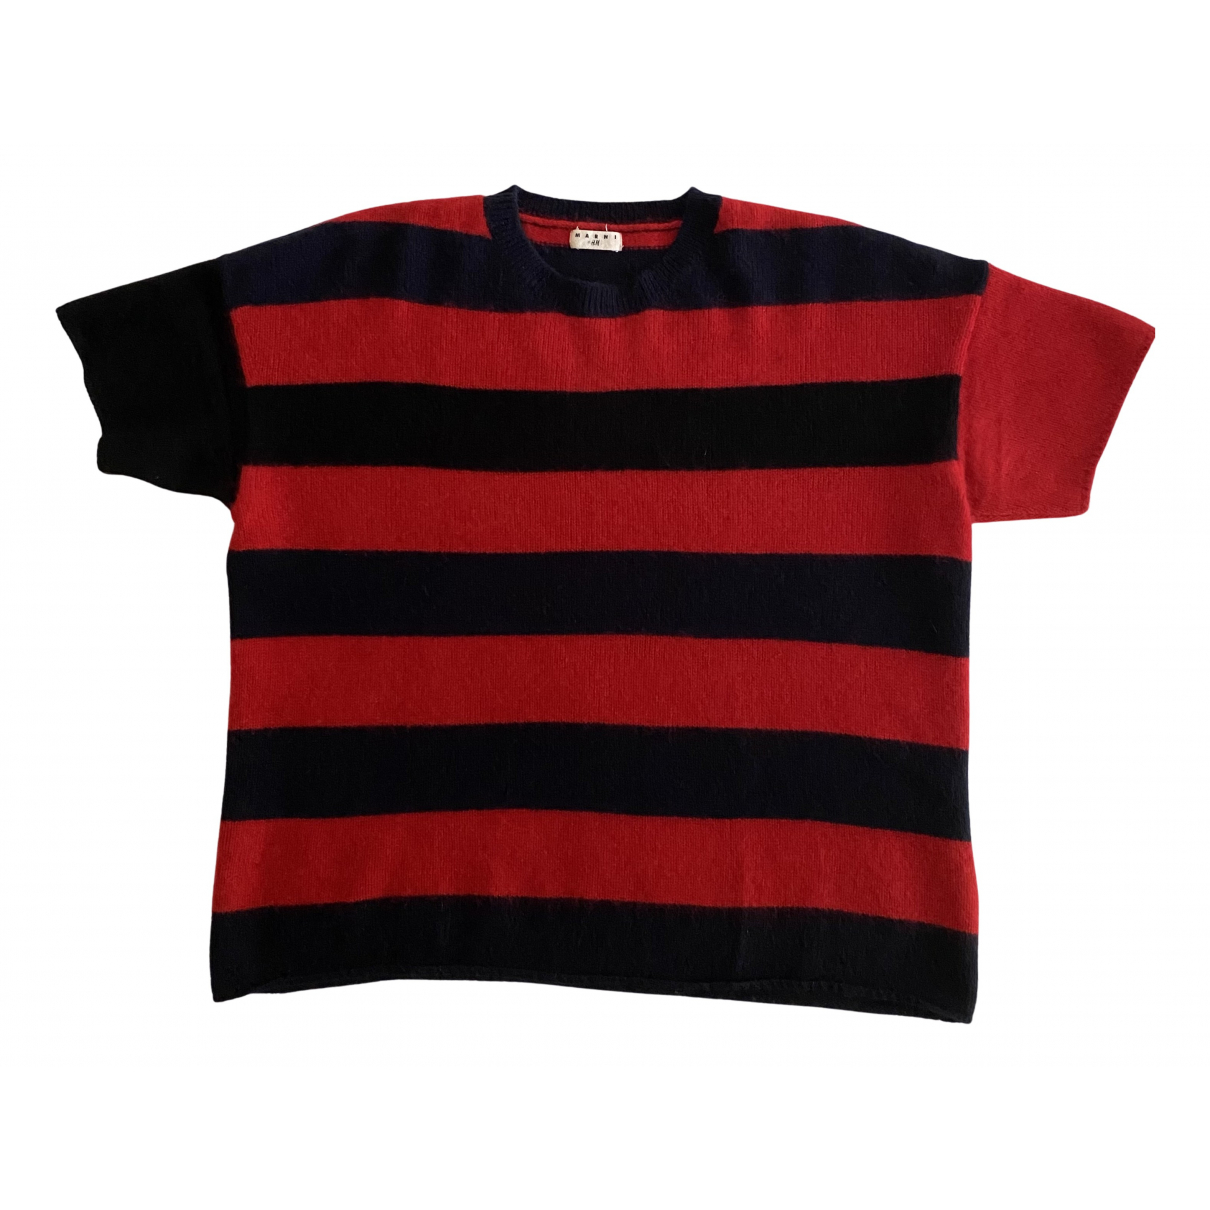 Marni For H&m N Multicolour Cashmere Knitwear & Sweatshirts for Men M International